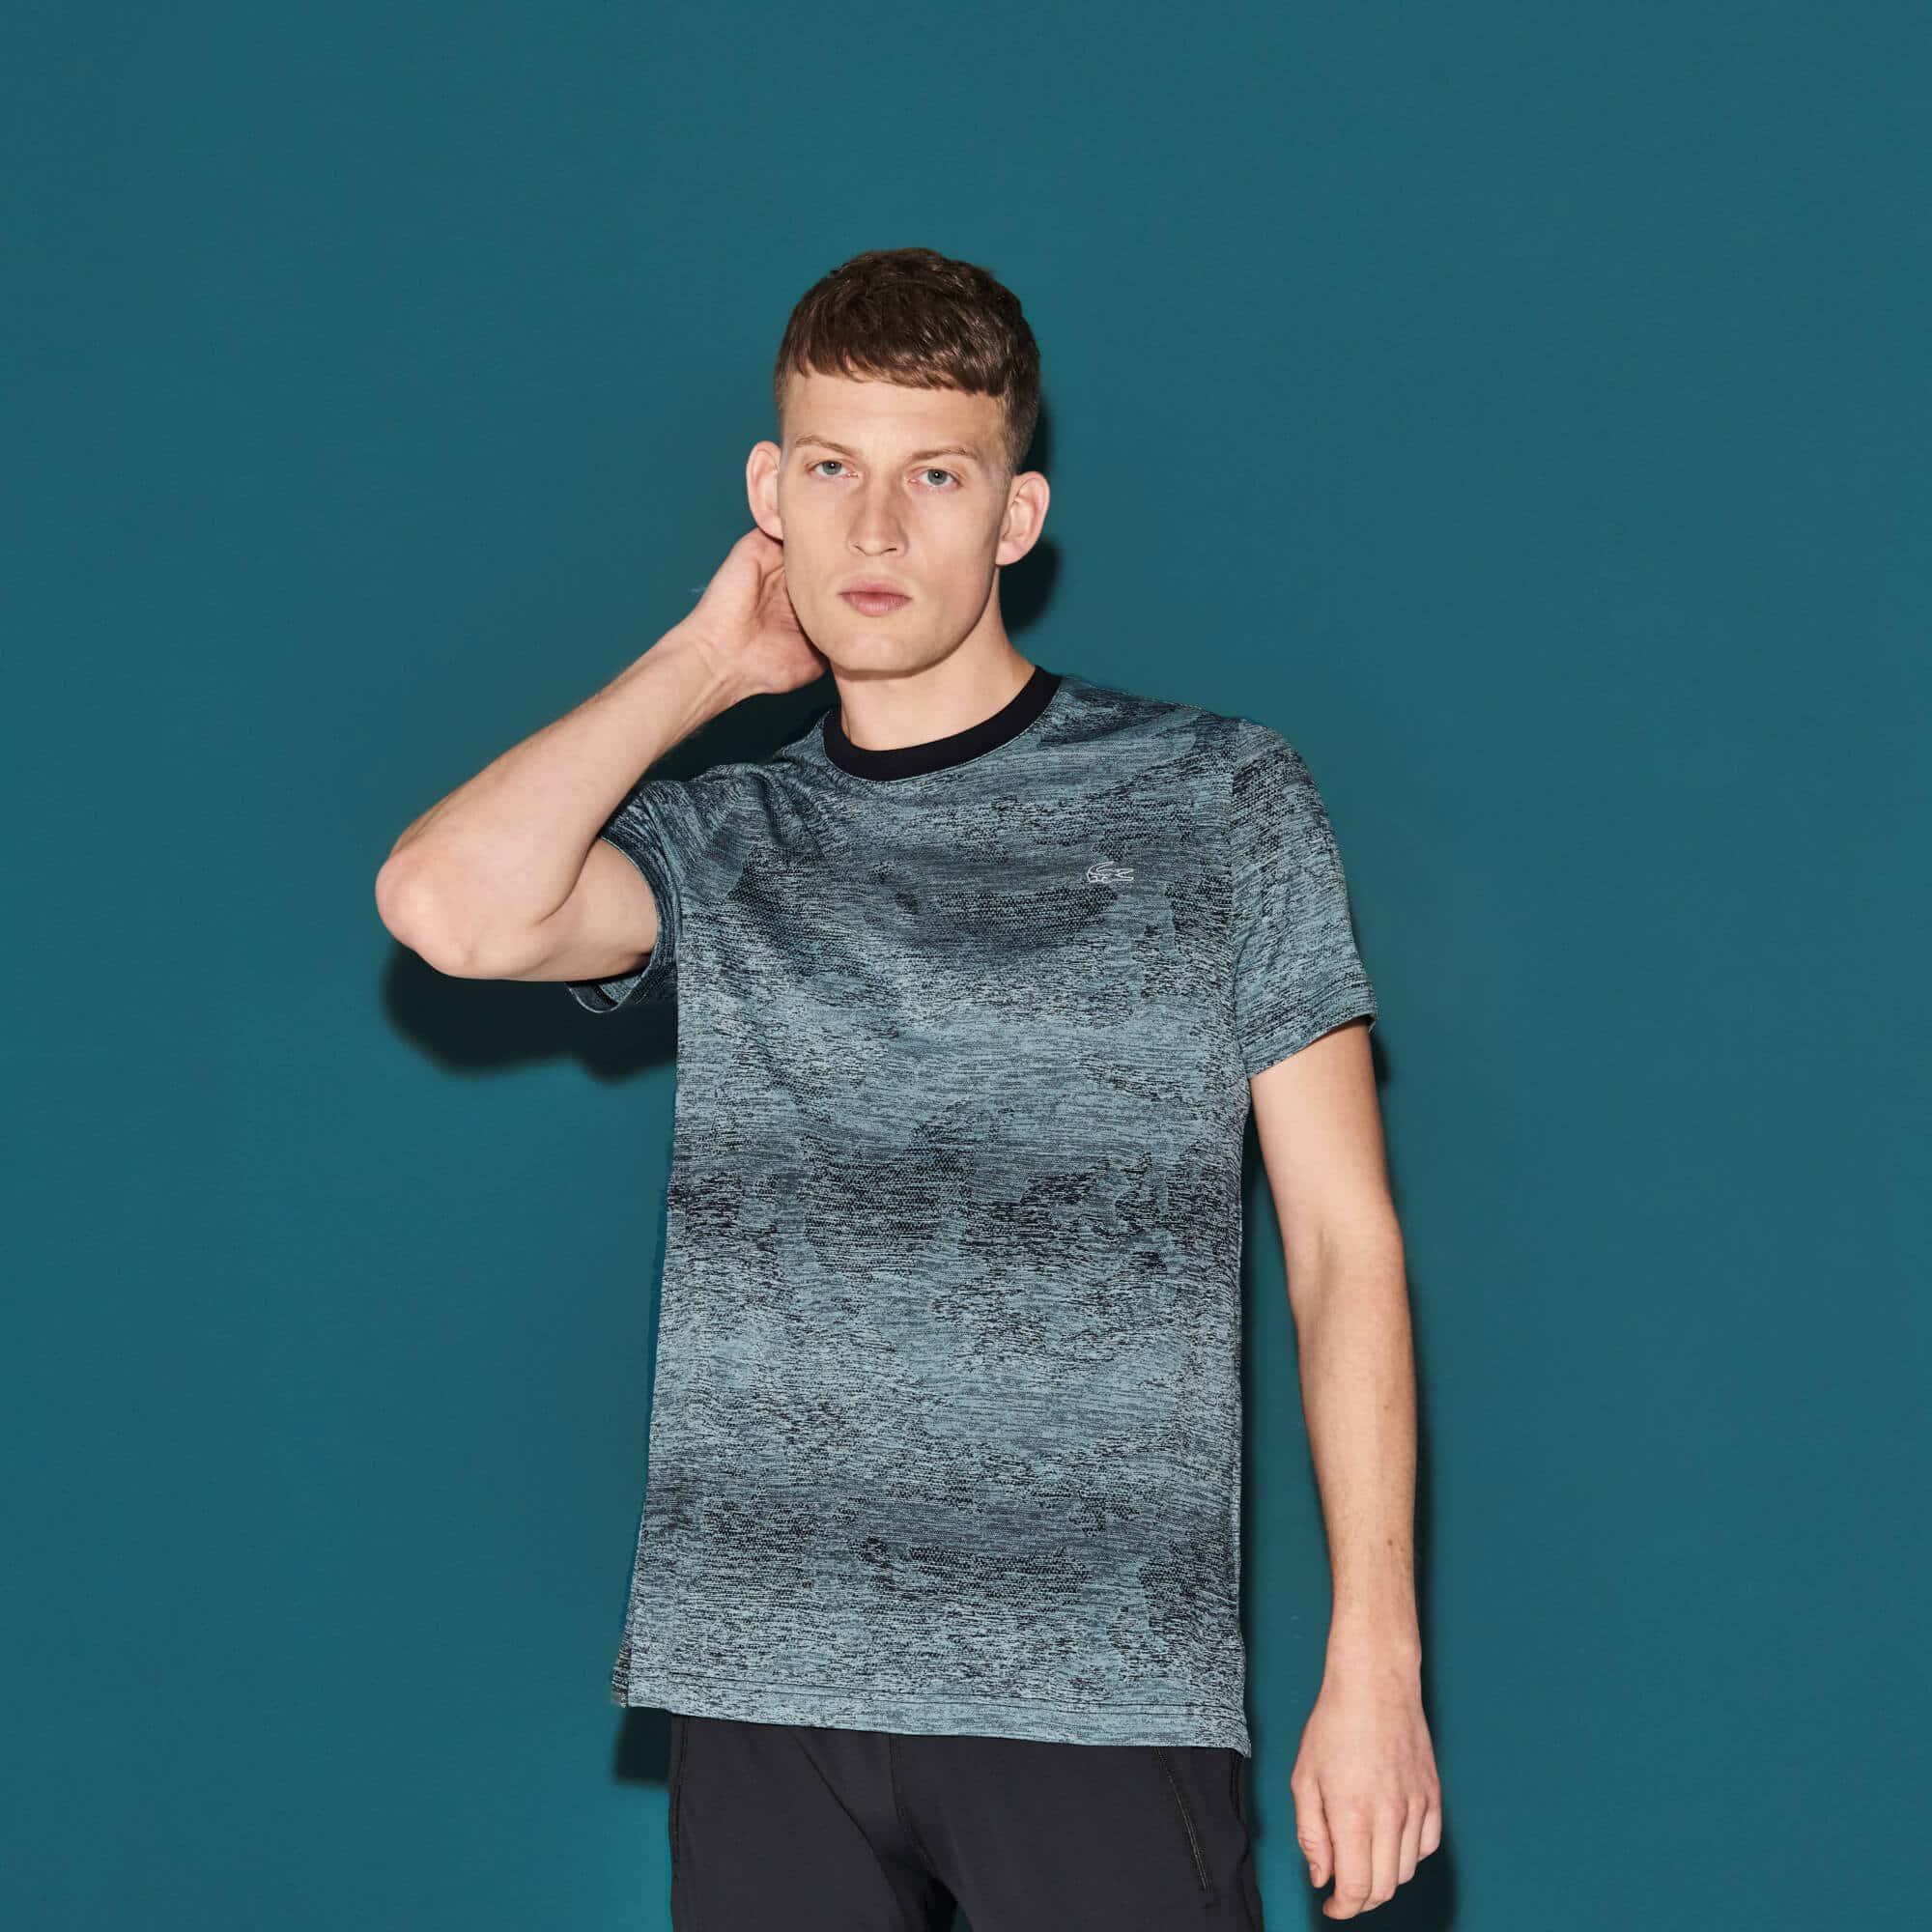 Herren LACOSTE SPORT Print Tennis T-Shirt aus Funktionsjersey